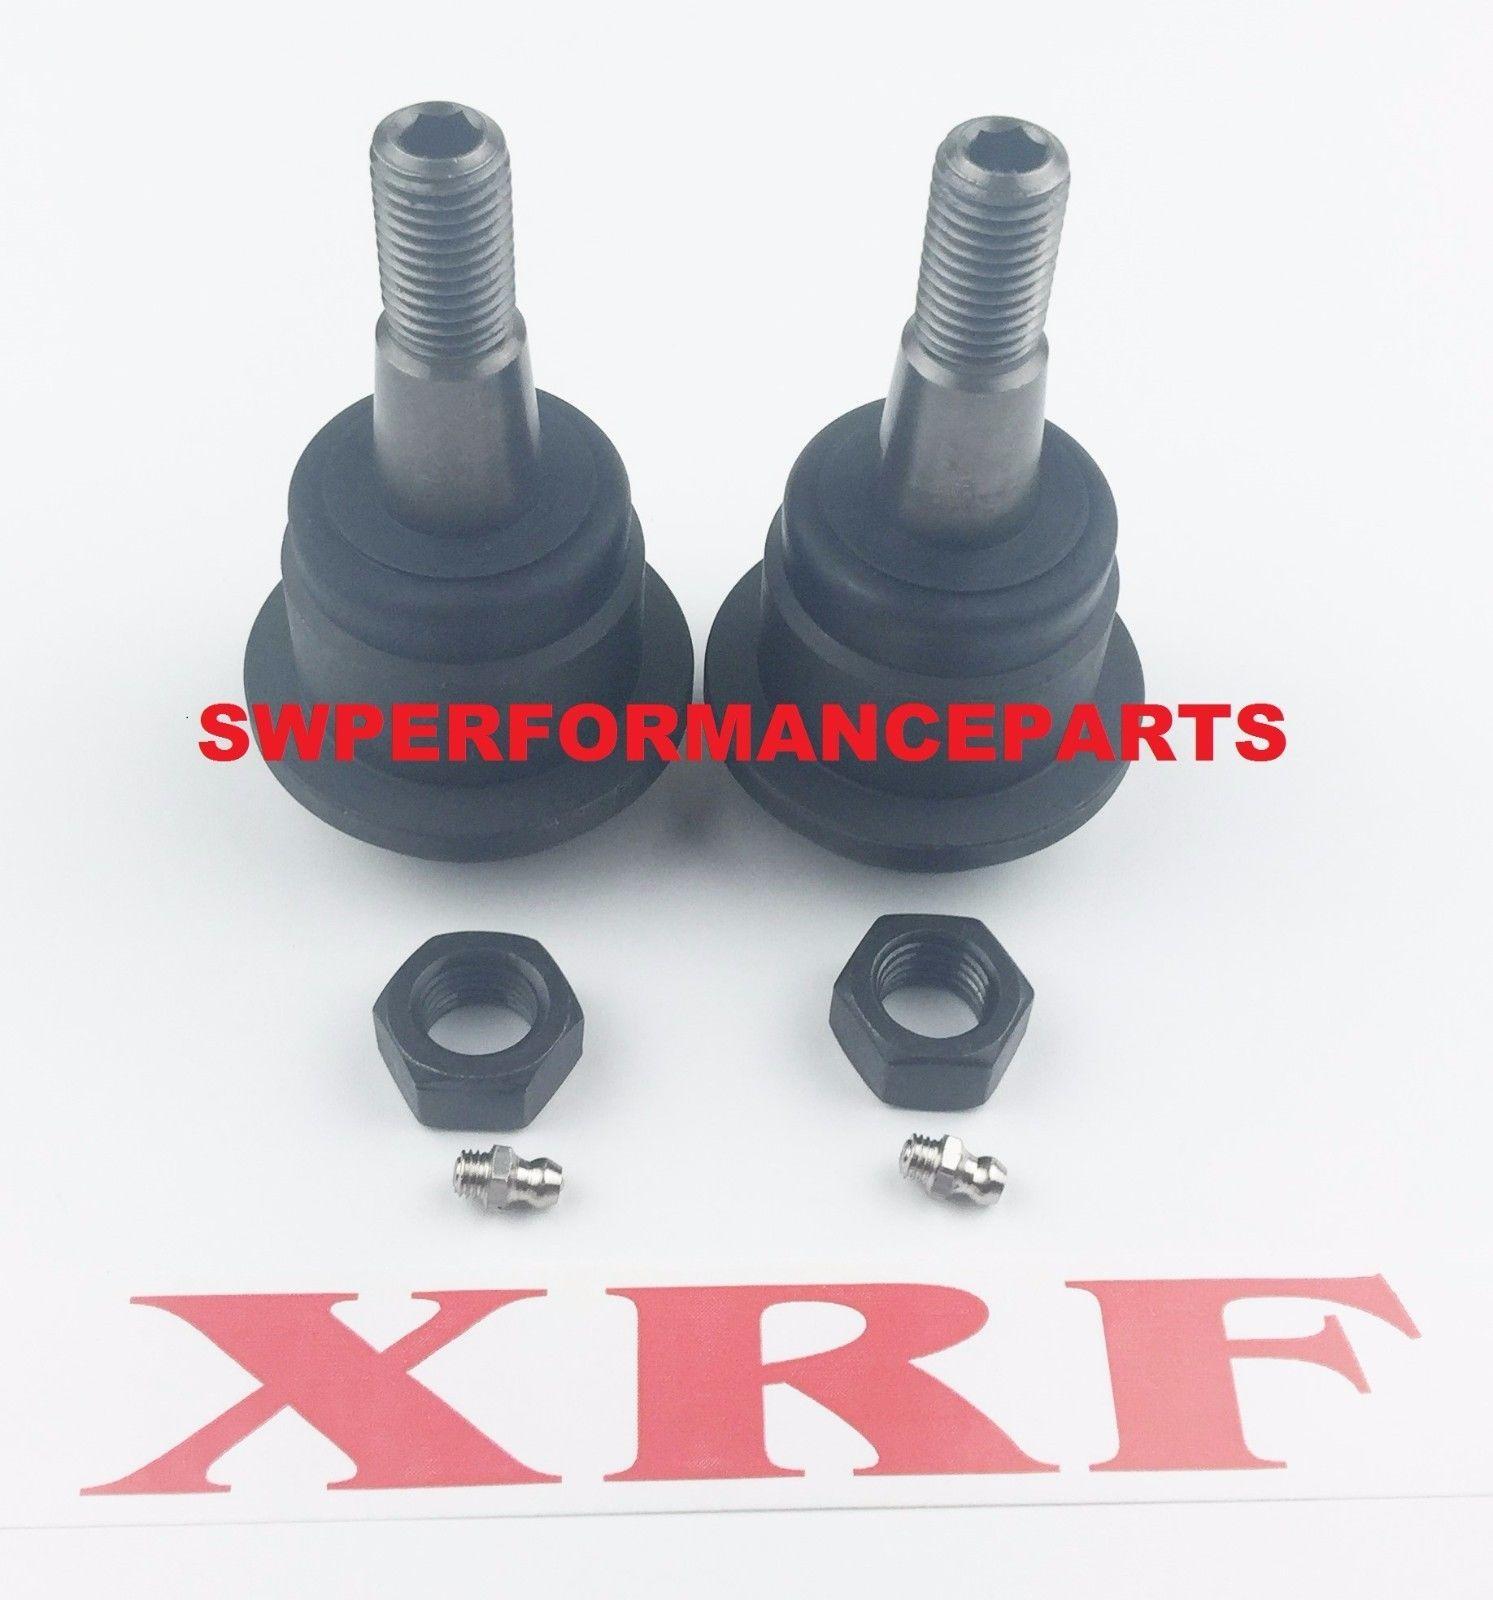 Build A 2013 3500 Kit: NEW XRF BALL JOINT KIT SET 2003-2013 RAM DODGE 2500 3500